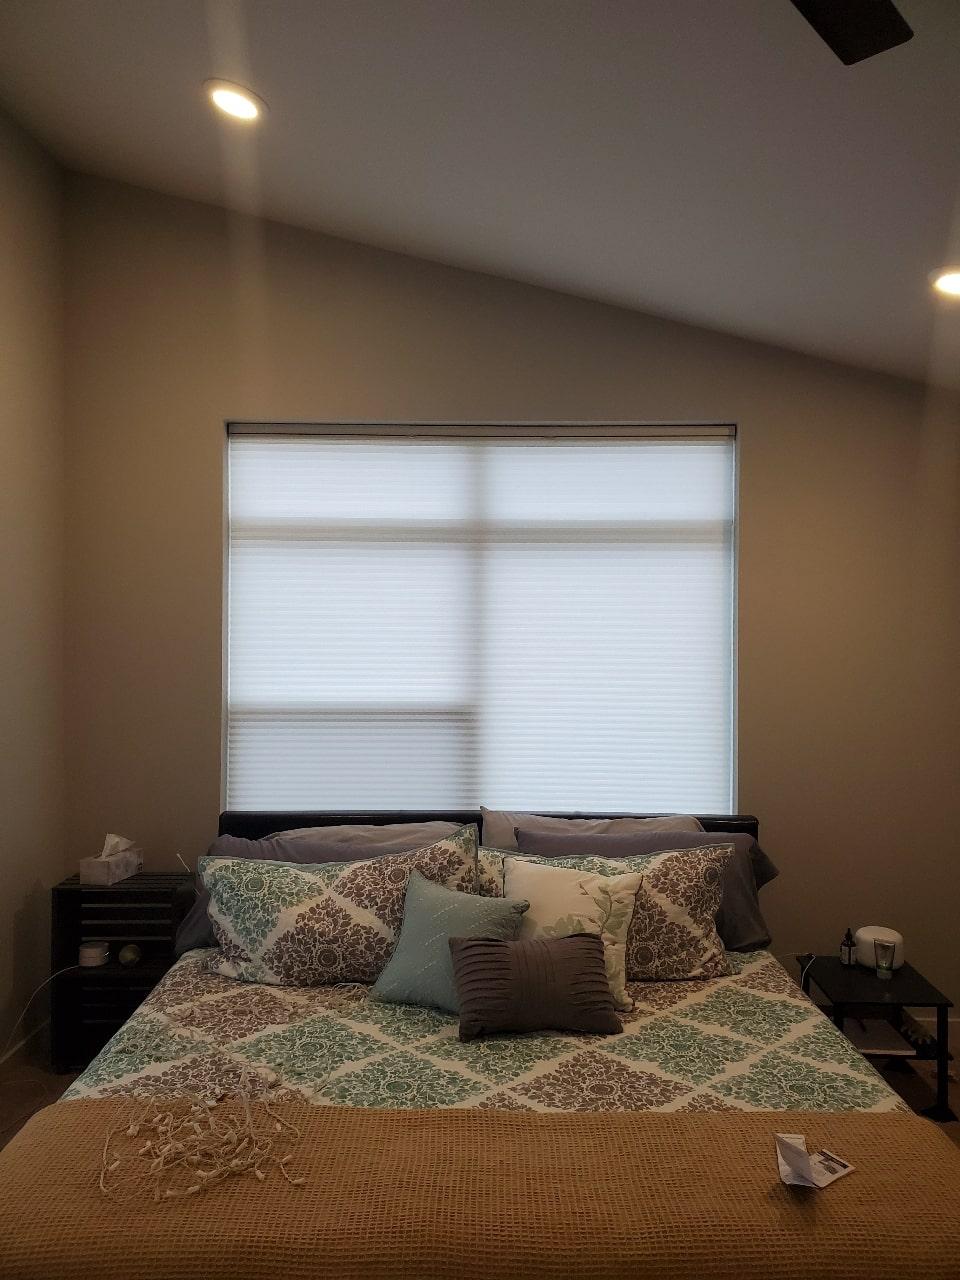 Window Cell Shade - Interior Window Plantation Shutters - Custom, Motorized Window Treatments, Blind Repair, Custom Blinds | Nashville, TN